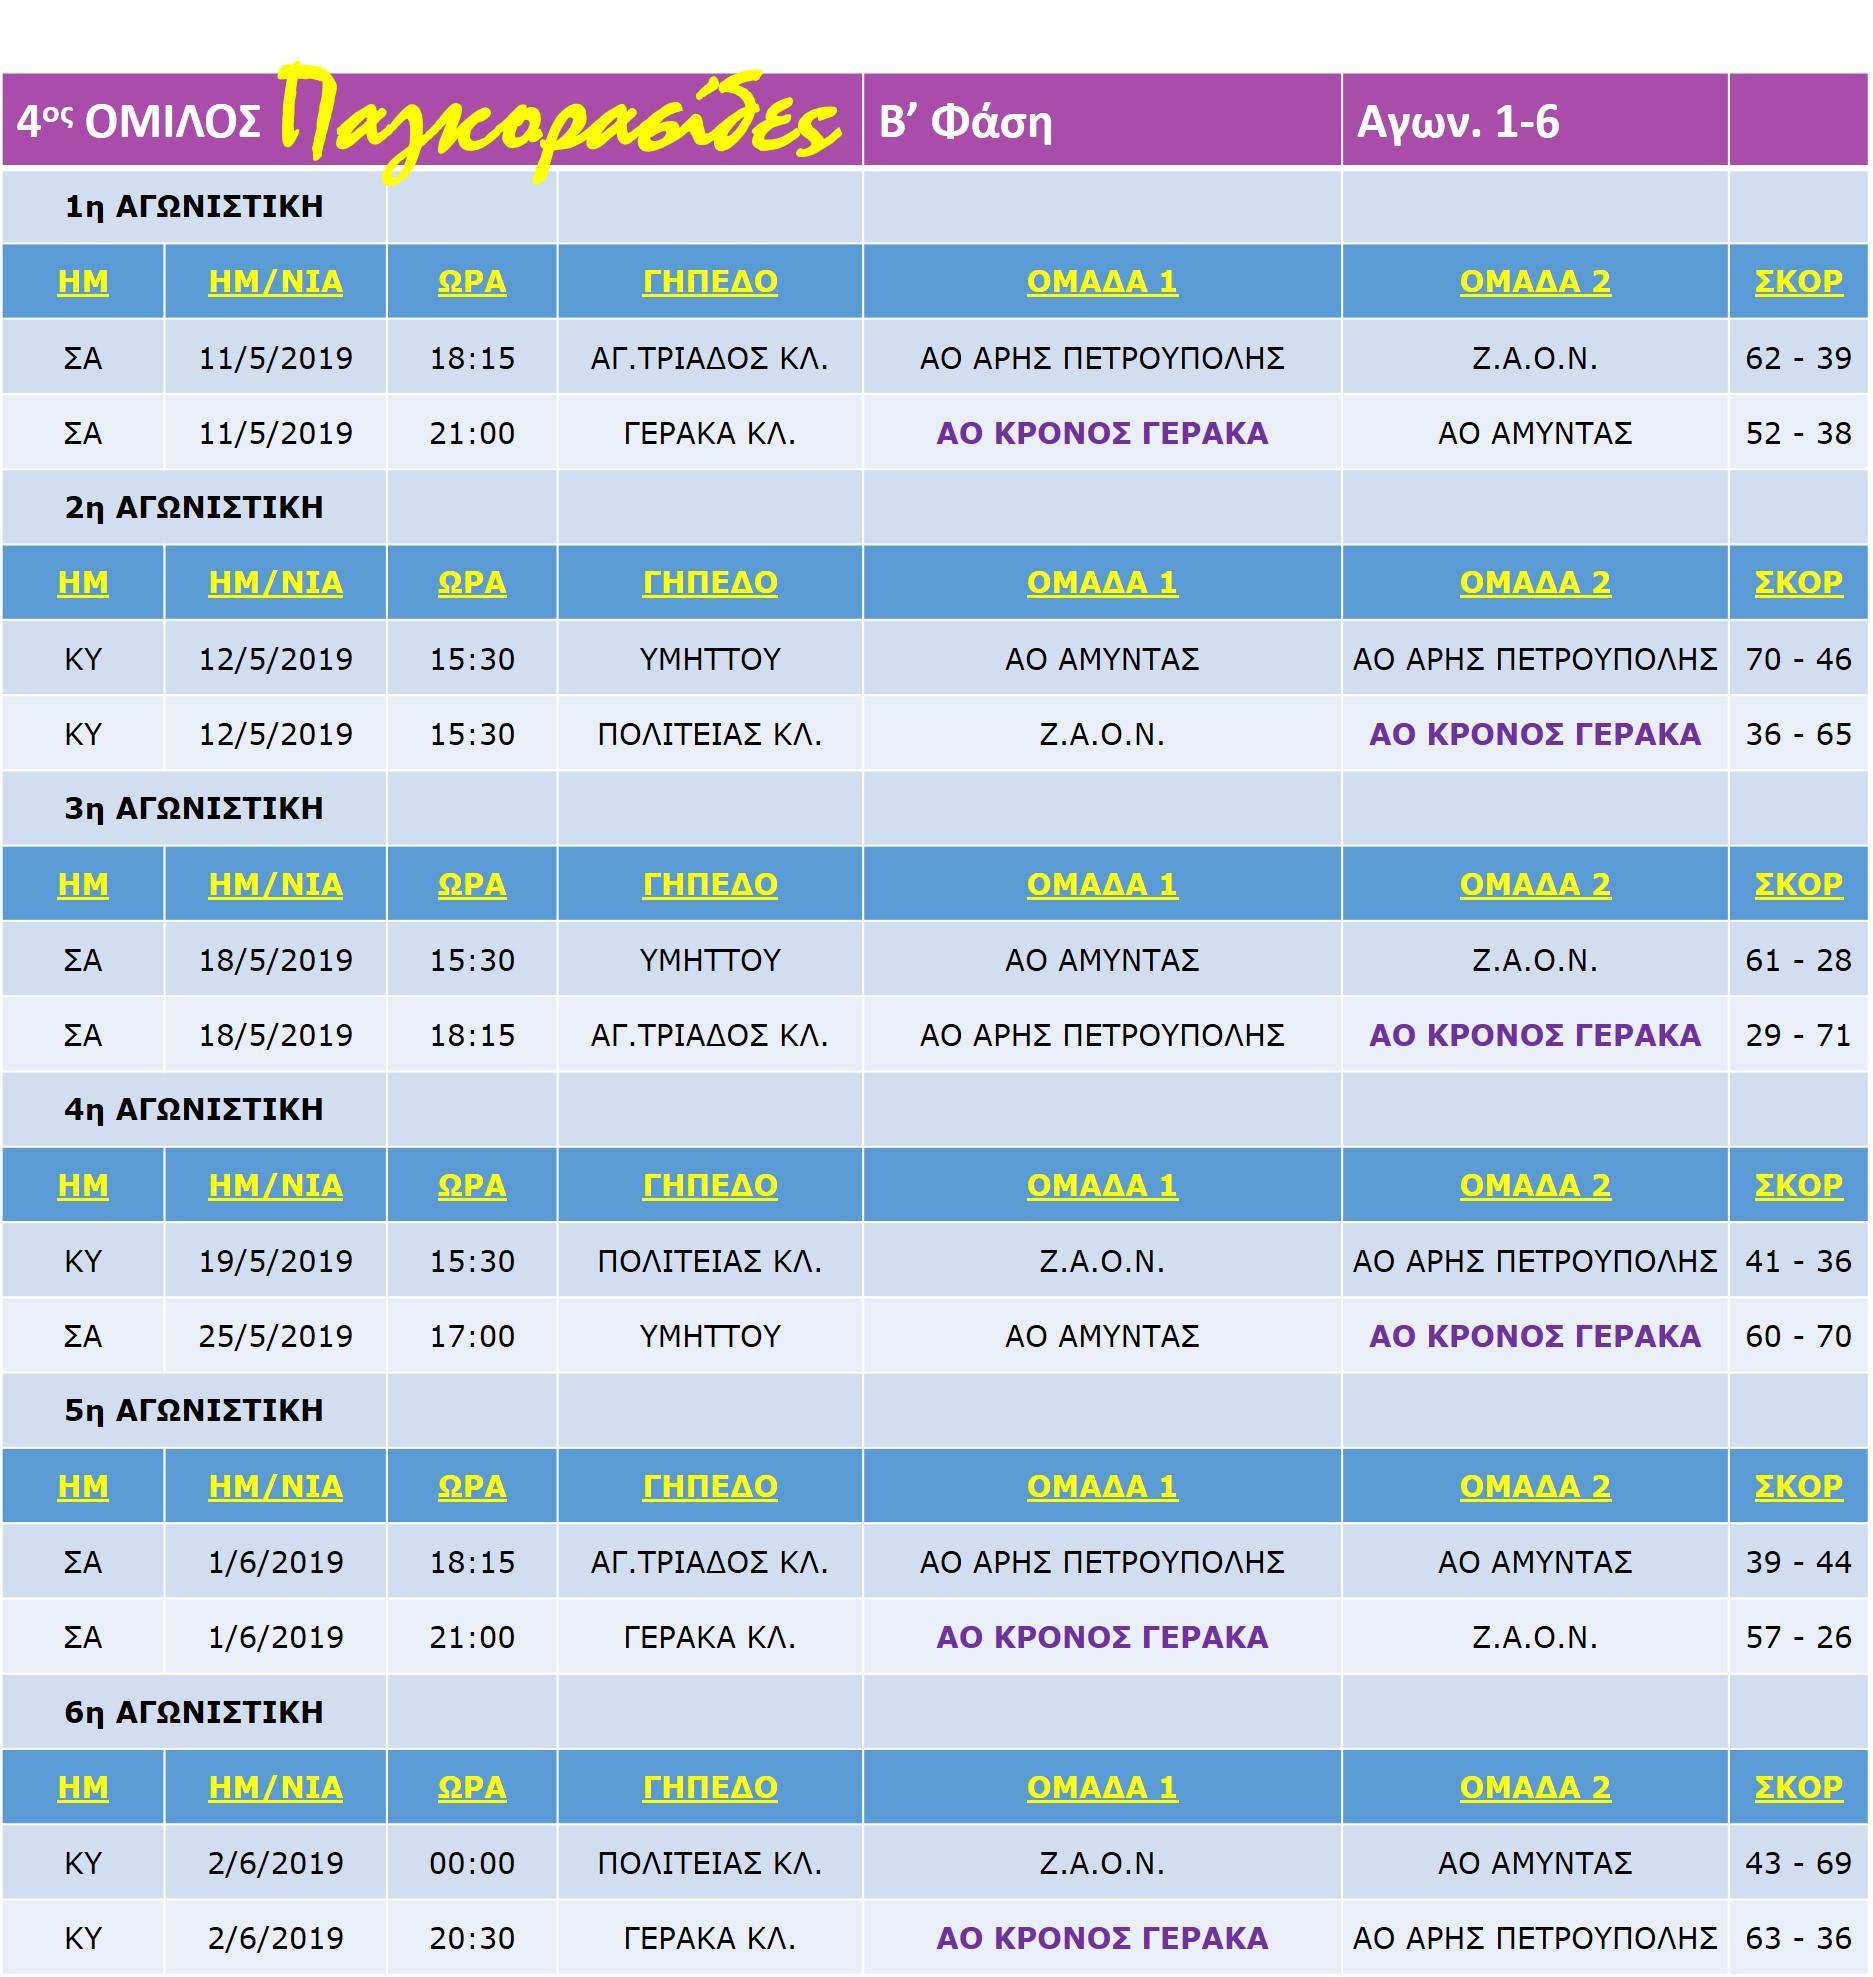 Pagkorasides_Match_B-Stage_1-6-6